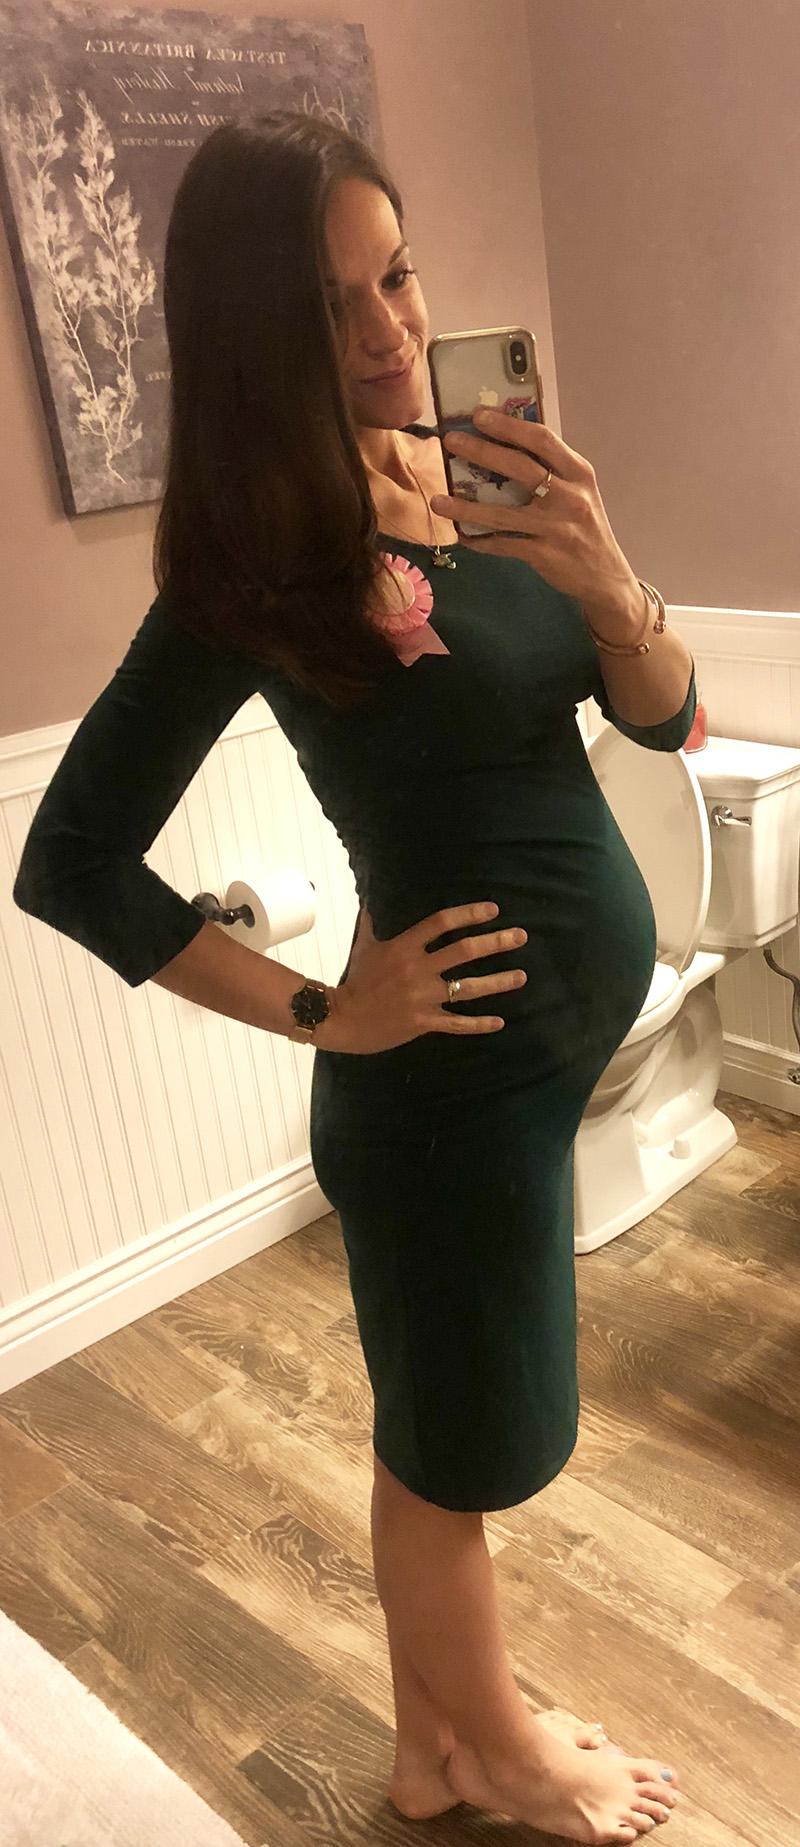 What 32 weeks pregnant looks like